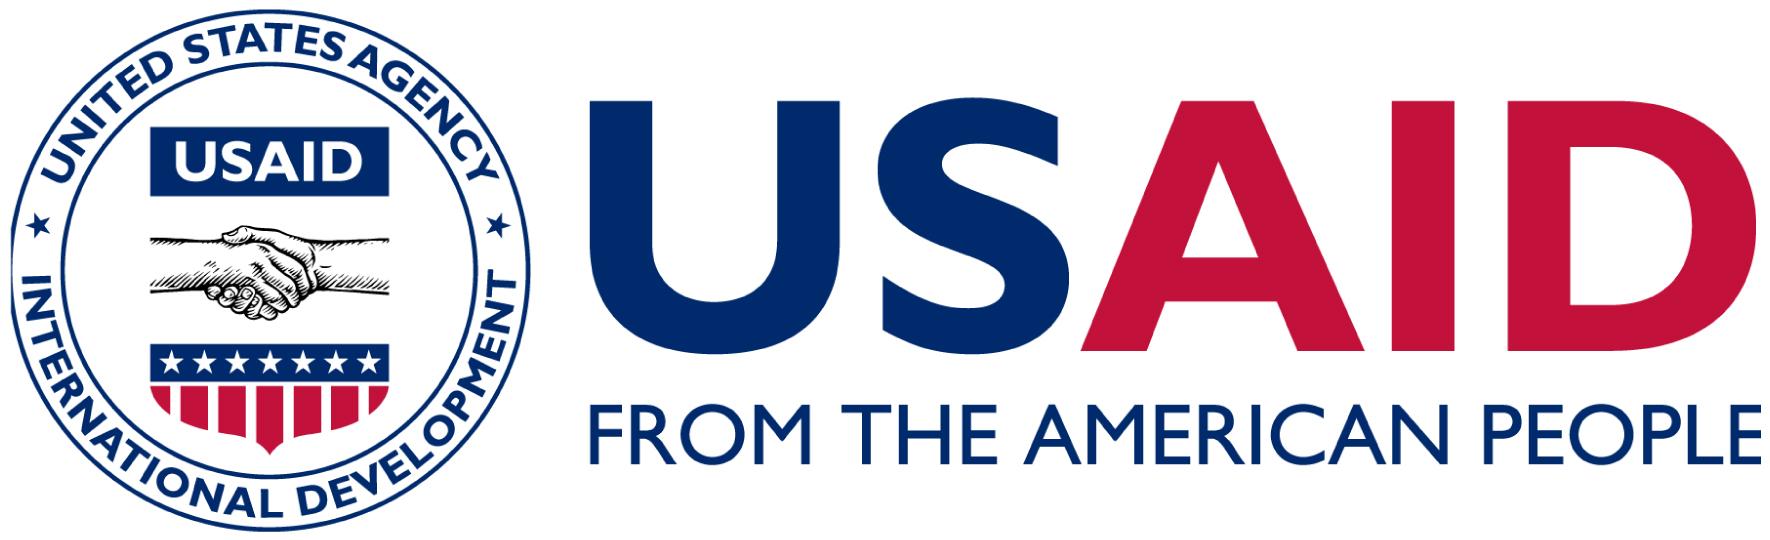 USAID.jpeg